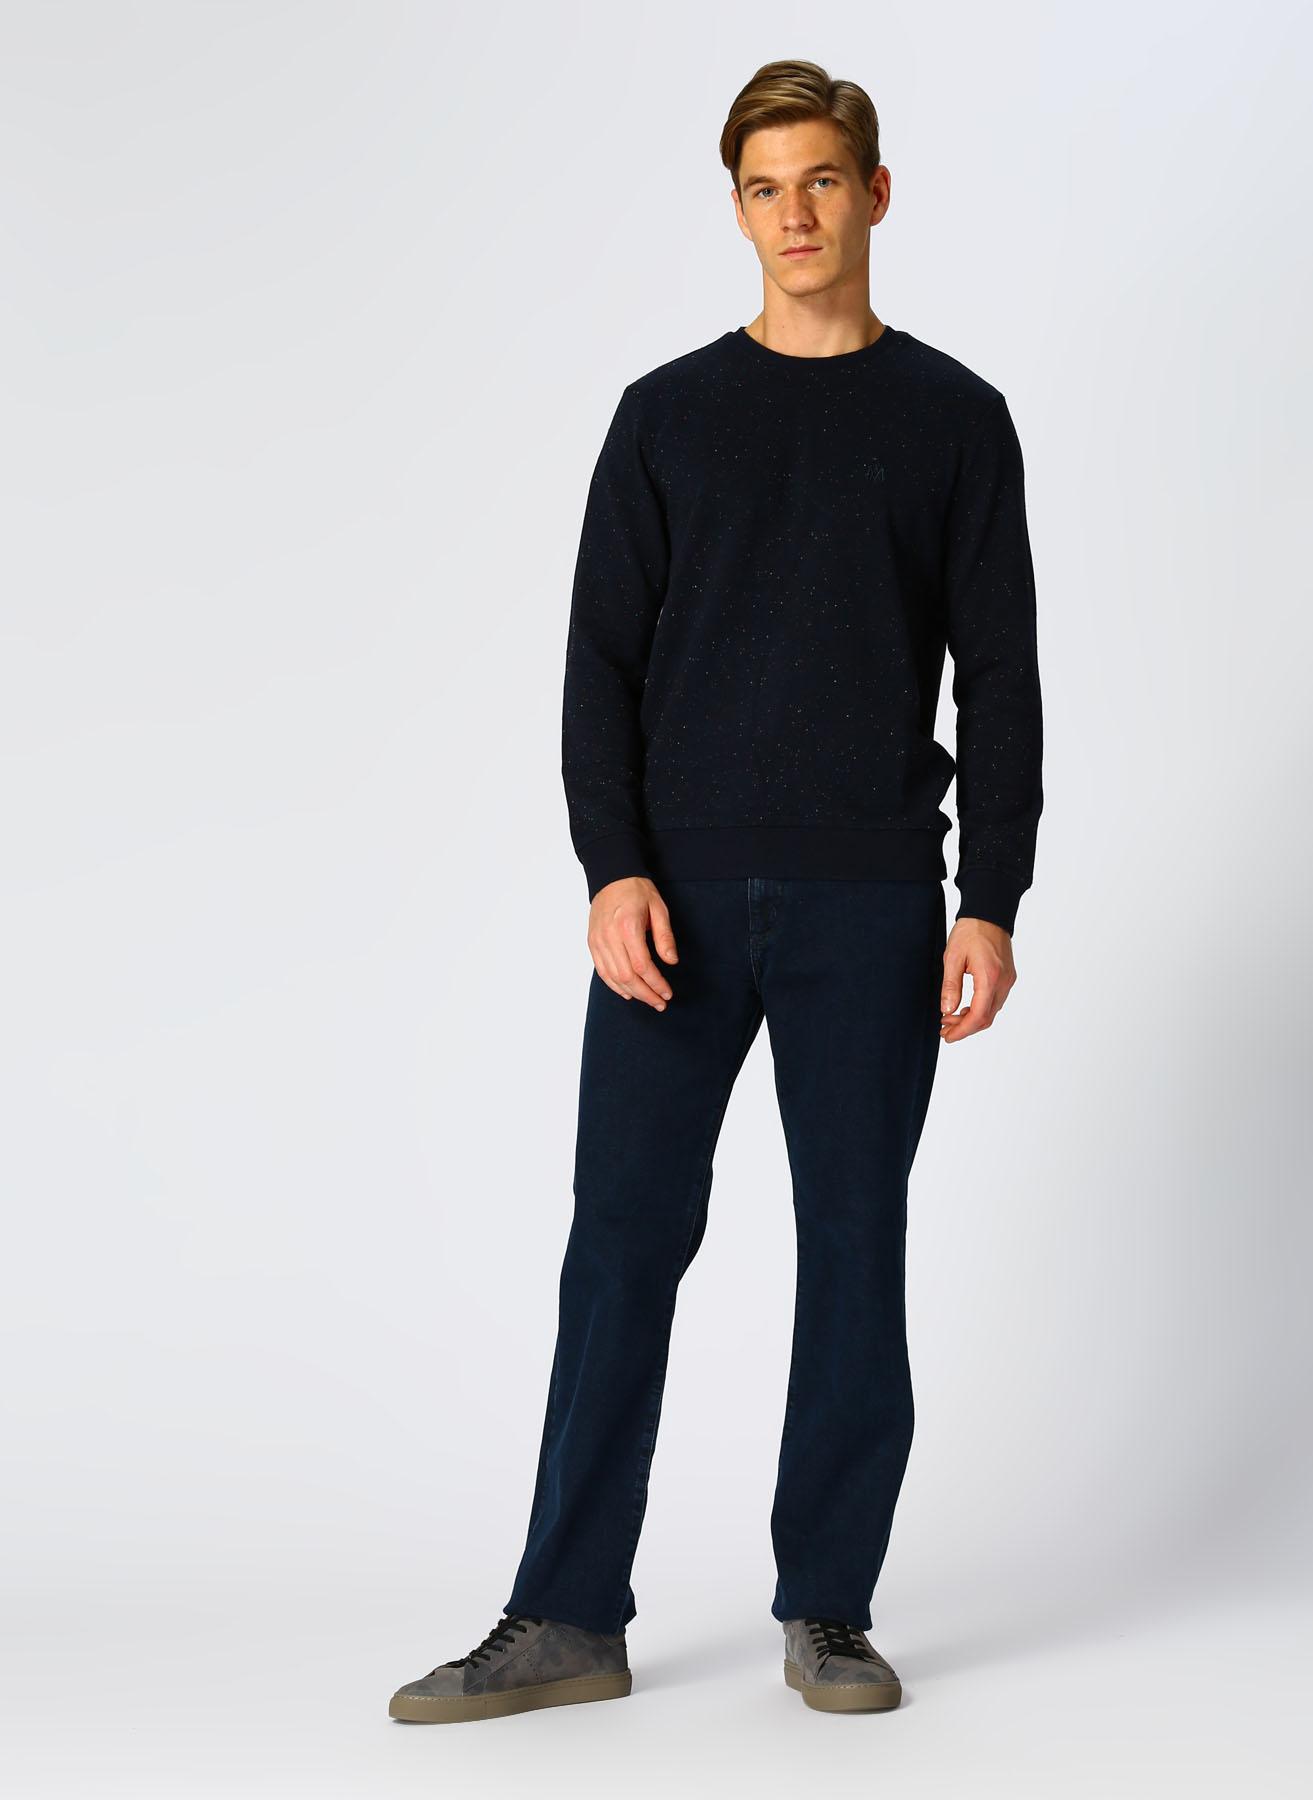 Mavi Klasik Pantolon 32-30 5001634307011 Ürün Resmi